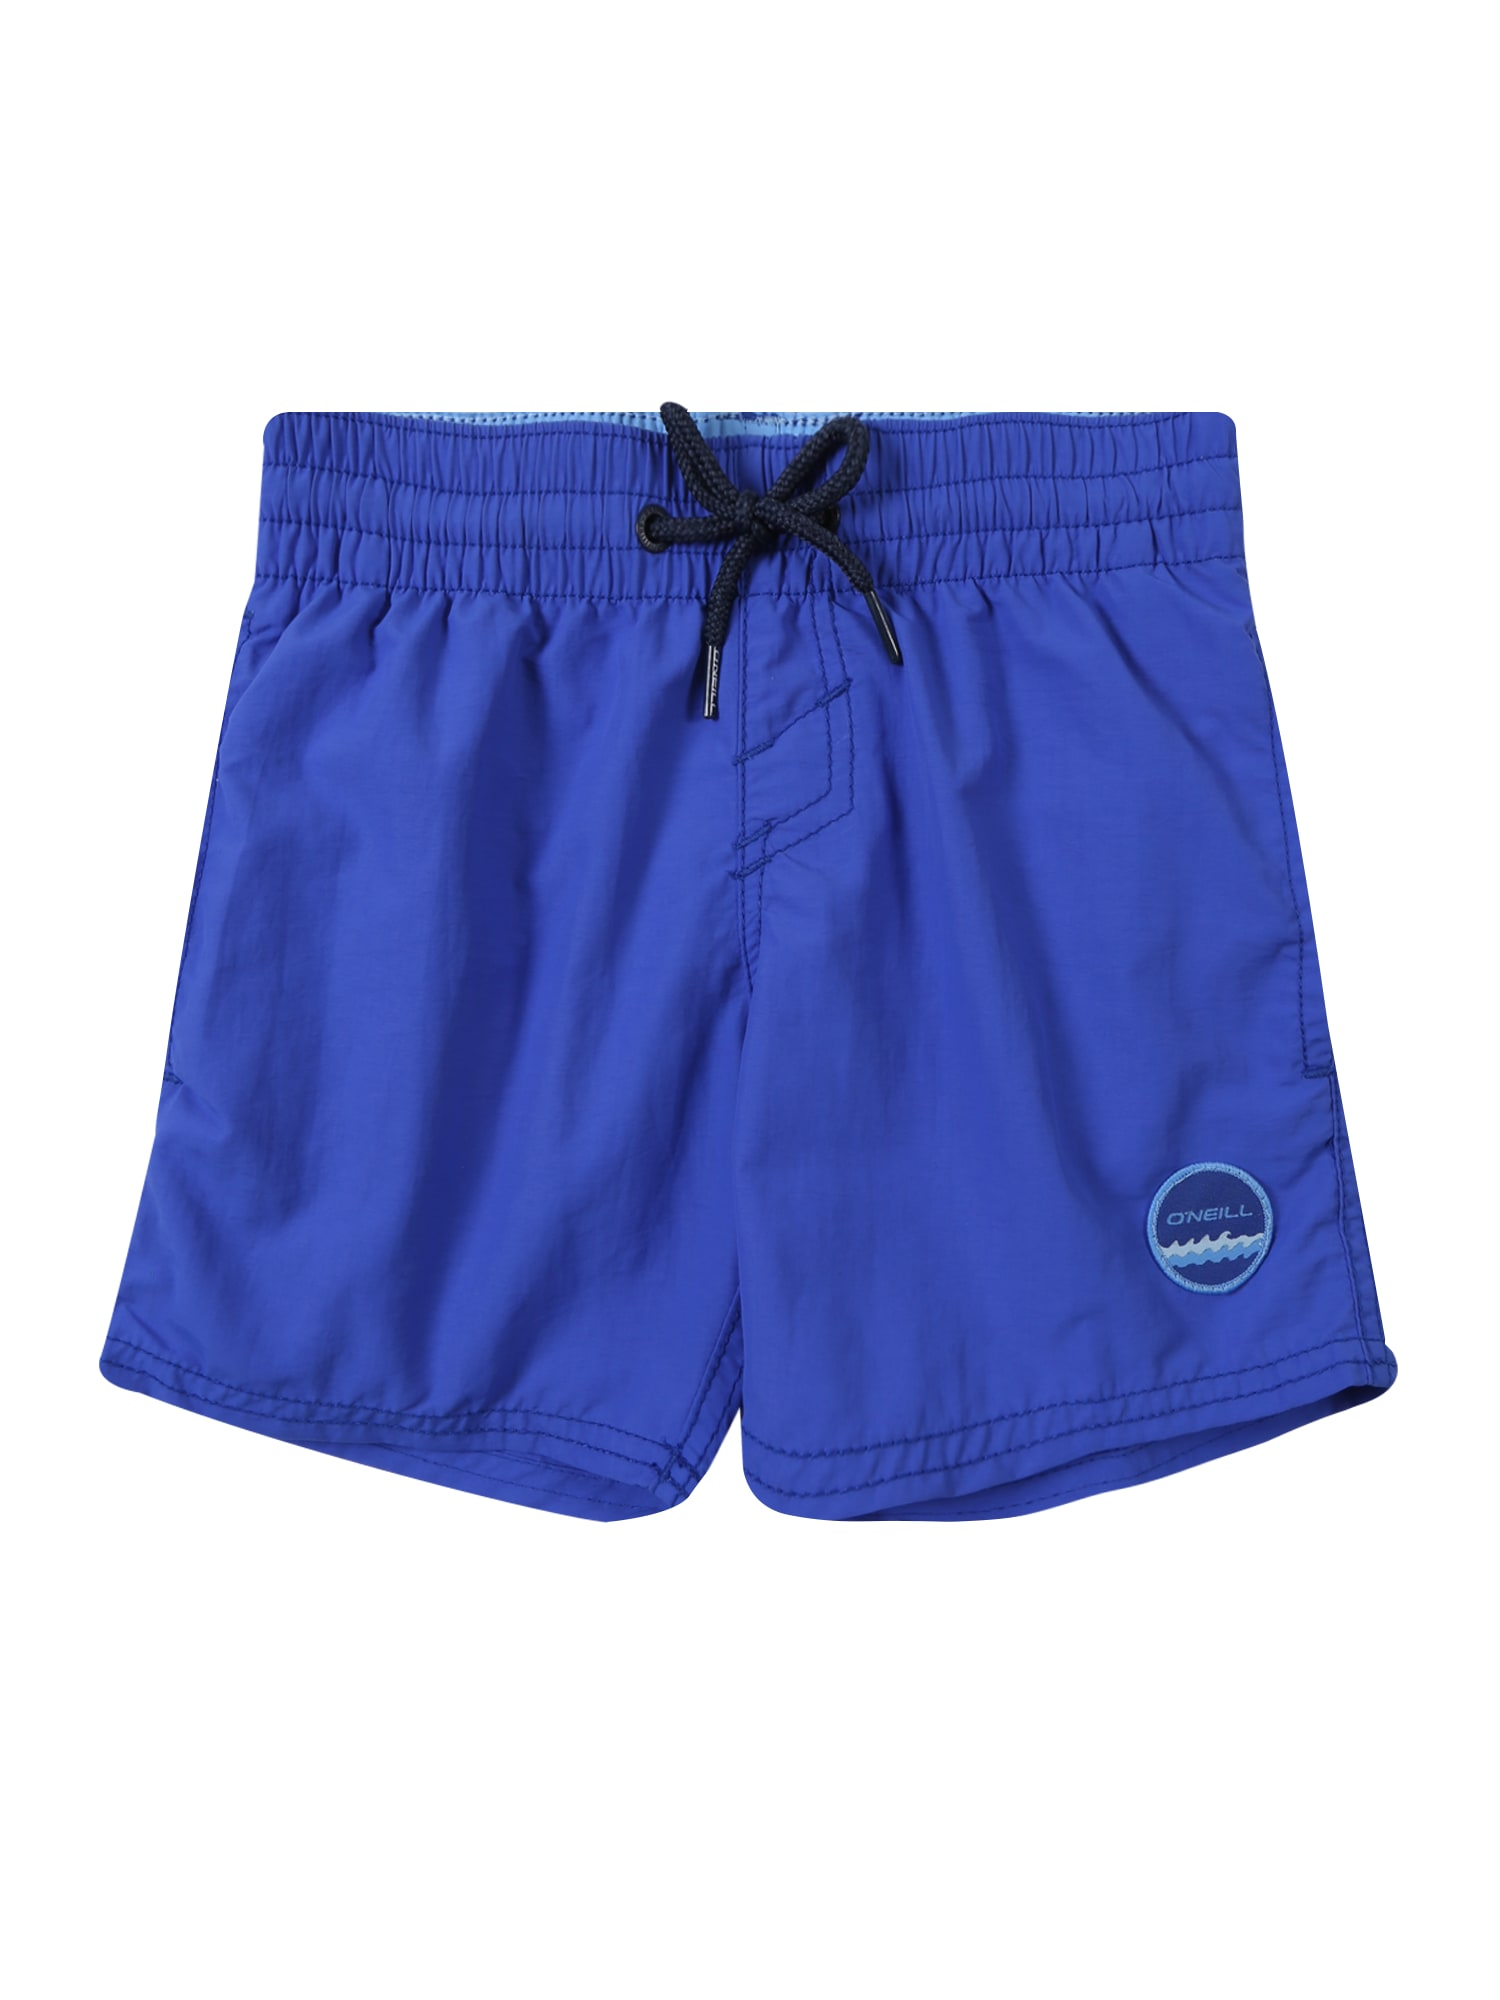 ONEILL Plavecké šortky PB VERT SHORTS modrá O'NEILL